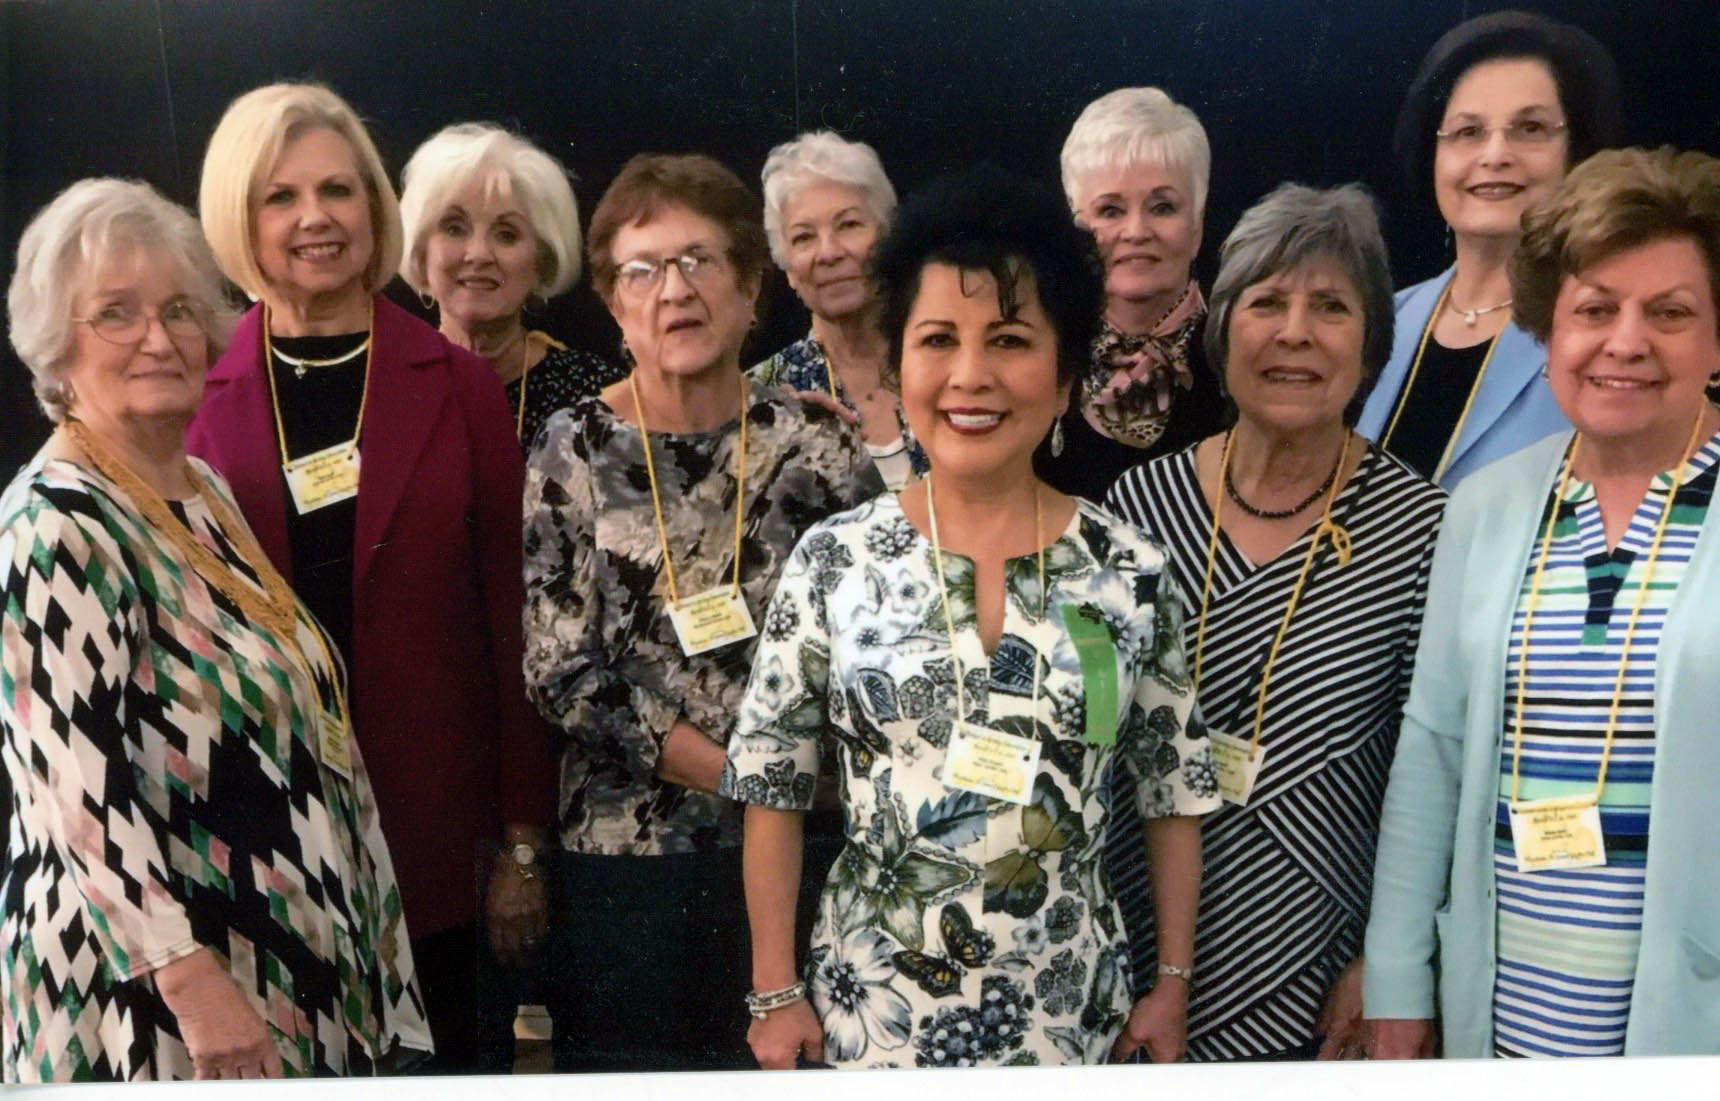 Judy Klimazewski, Beth Pesek, Sandra Tipton, Pat Woods, Janella Garrett, Yulin Brewer, Belinda Lum, Jan Scott, Devona Cowling and Wanda Henry